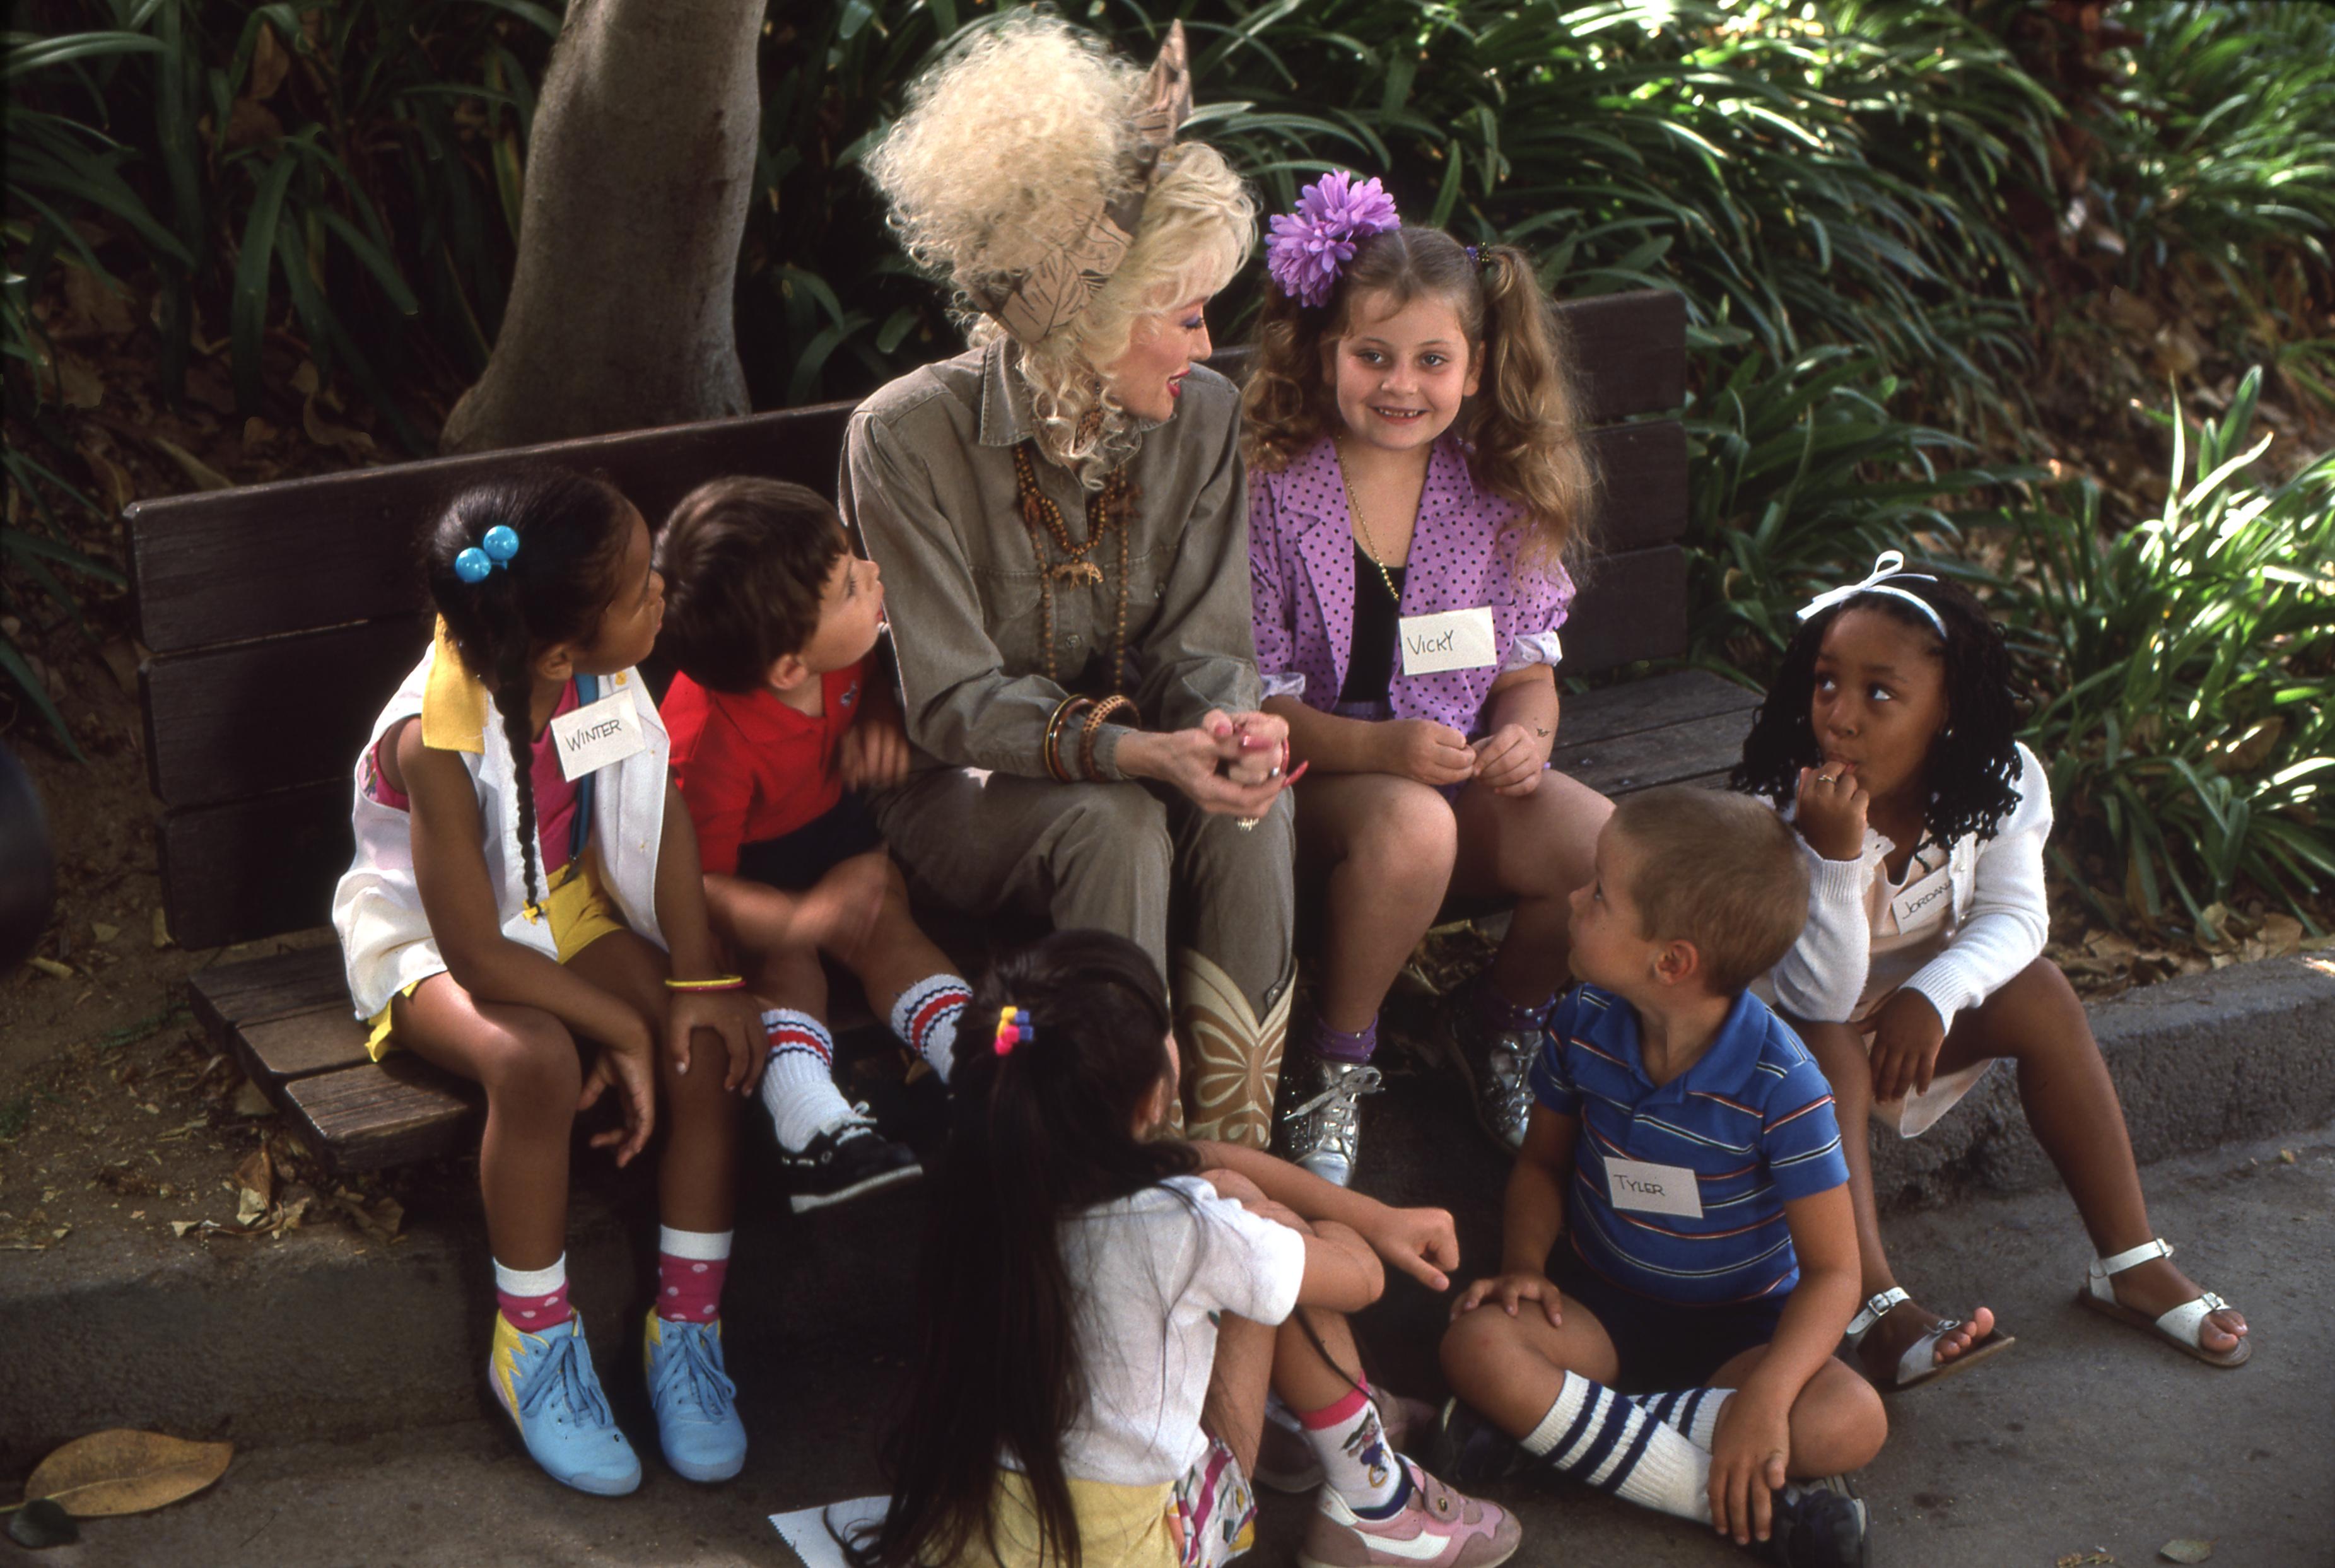 Dolly Parton kids